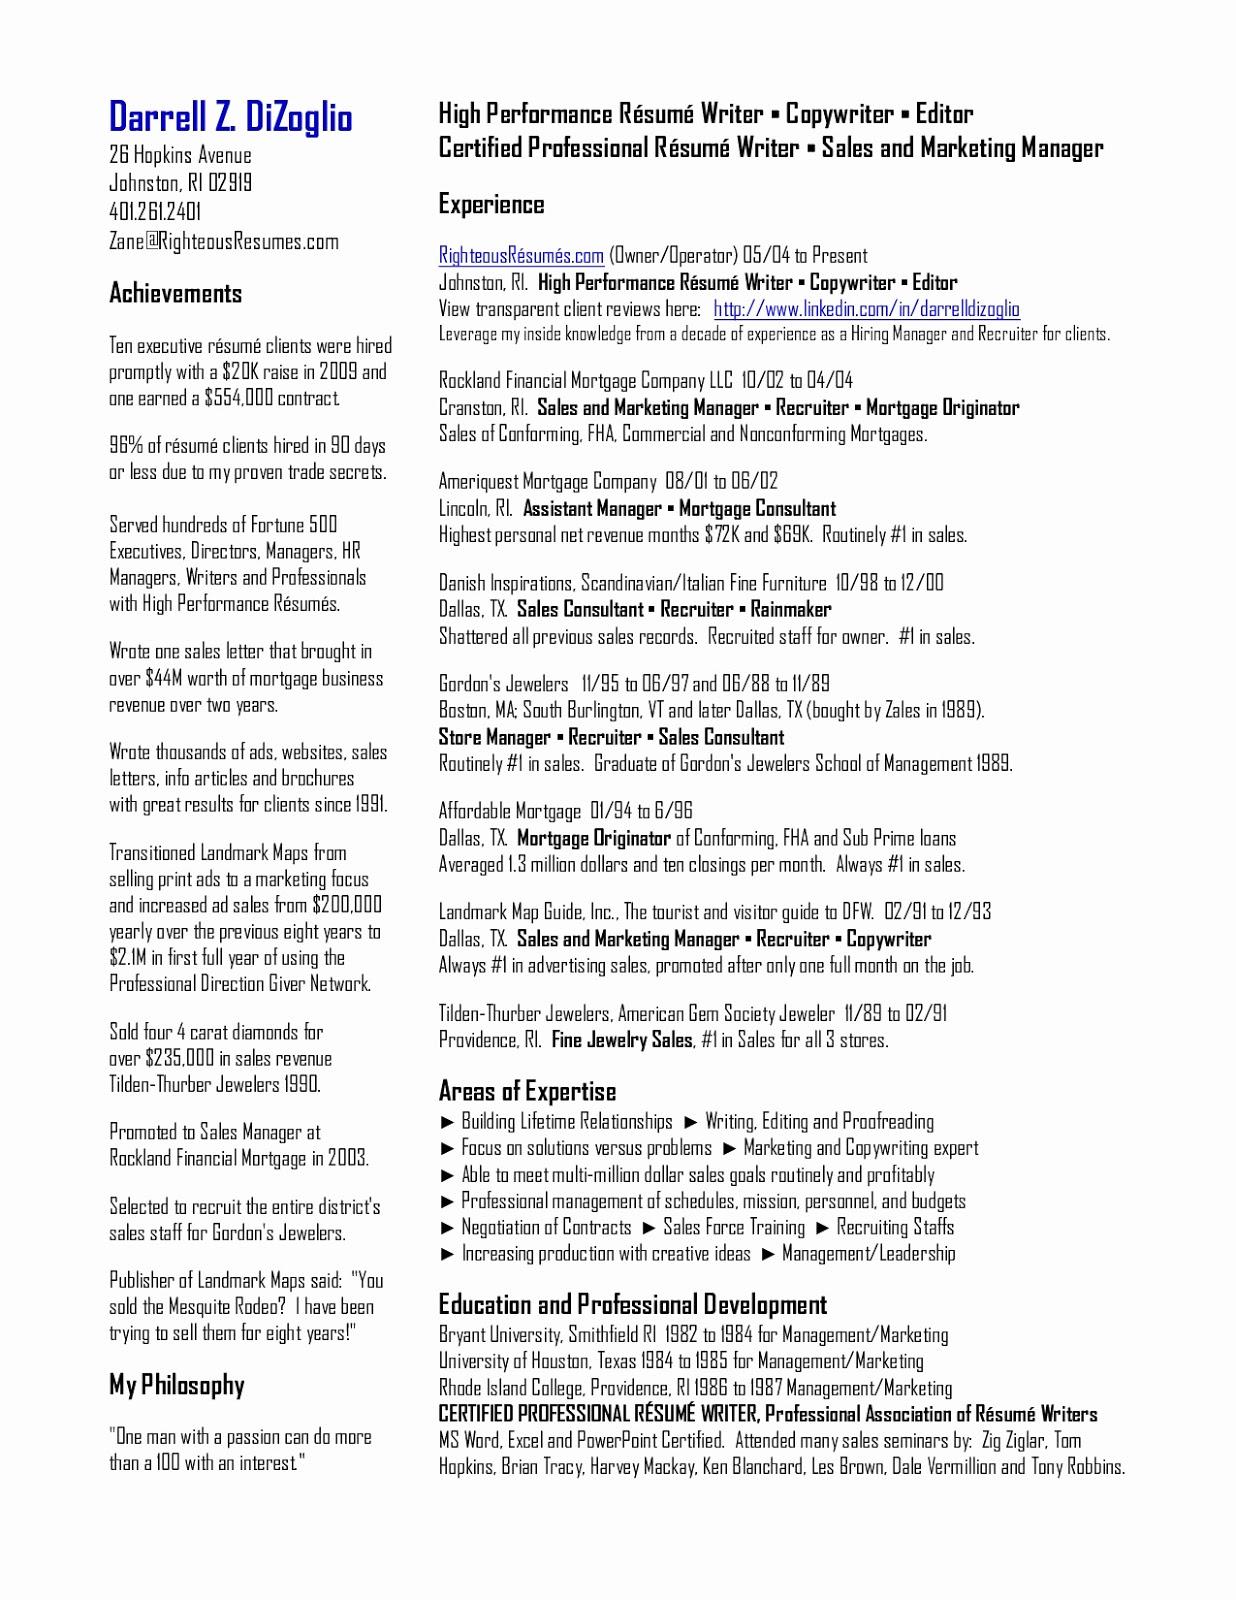 Security Guard Resume Template 2019, security guard resume template, security guard resume template for free, security guard cv template, Security Guard Resume Template 2020, security guard cv template uk, unarmed security guard resume template, security guard cv word template, entry level security guard resume templates, resume template for a security guard, security guard resume sample .doc, security guard resume sample download, security guard cv samples doc